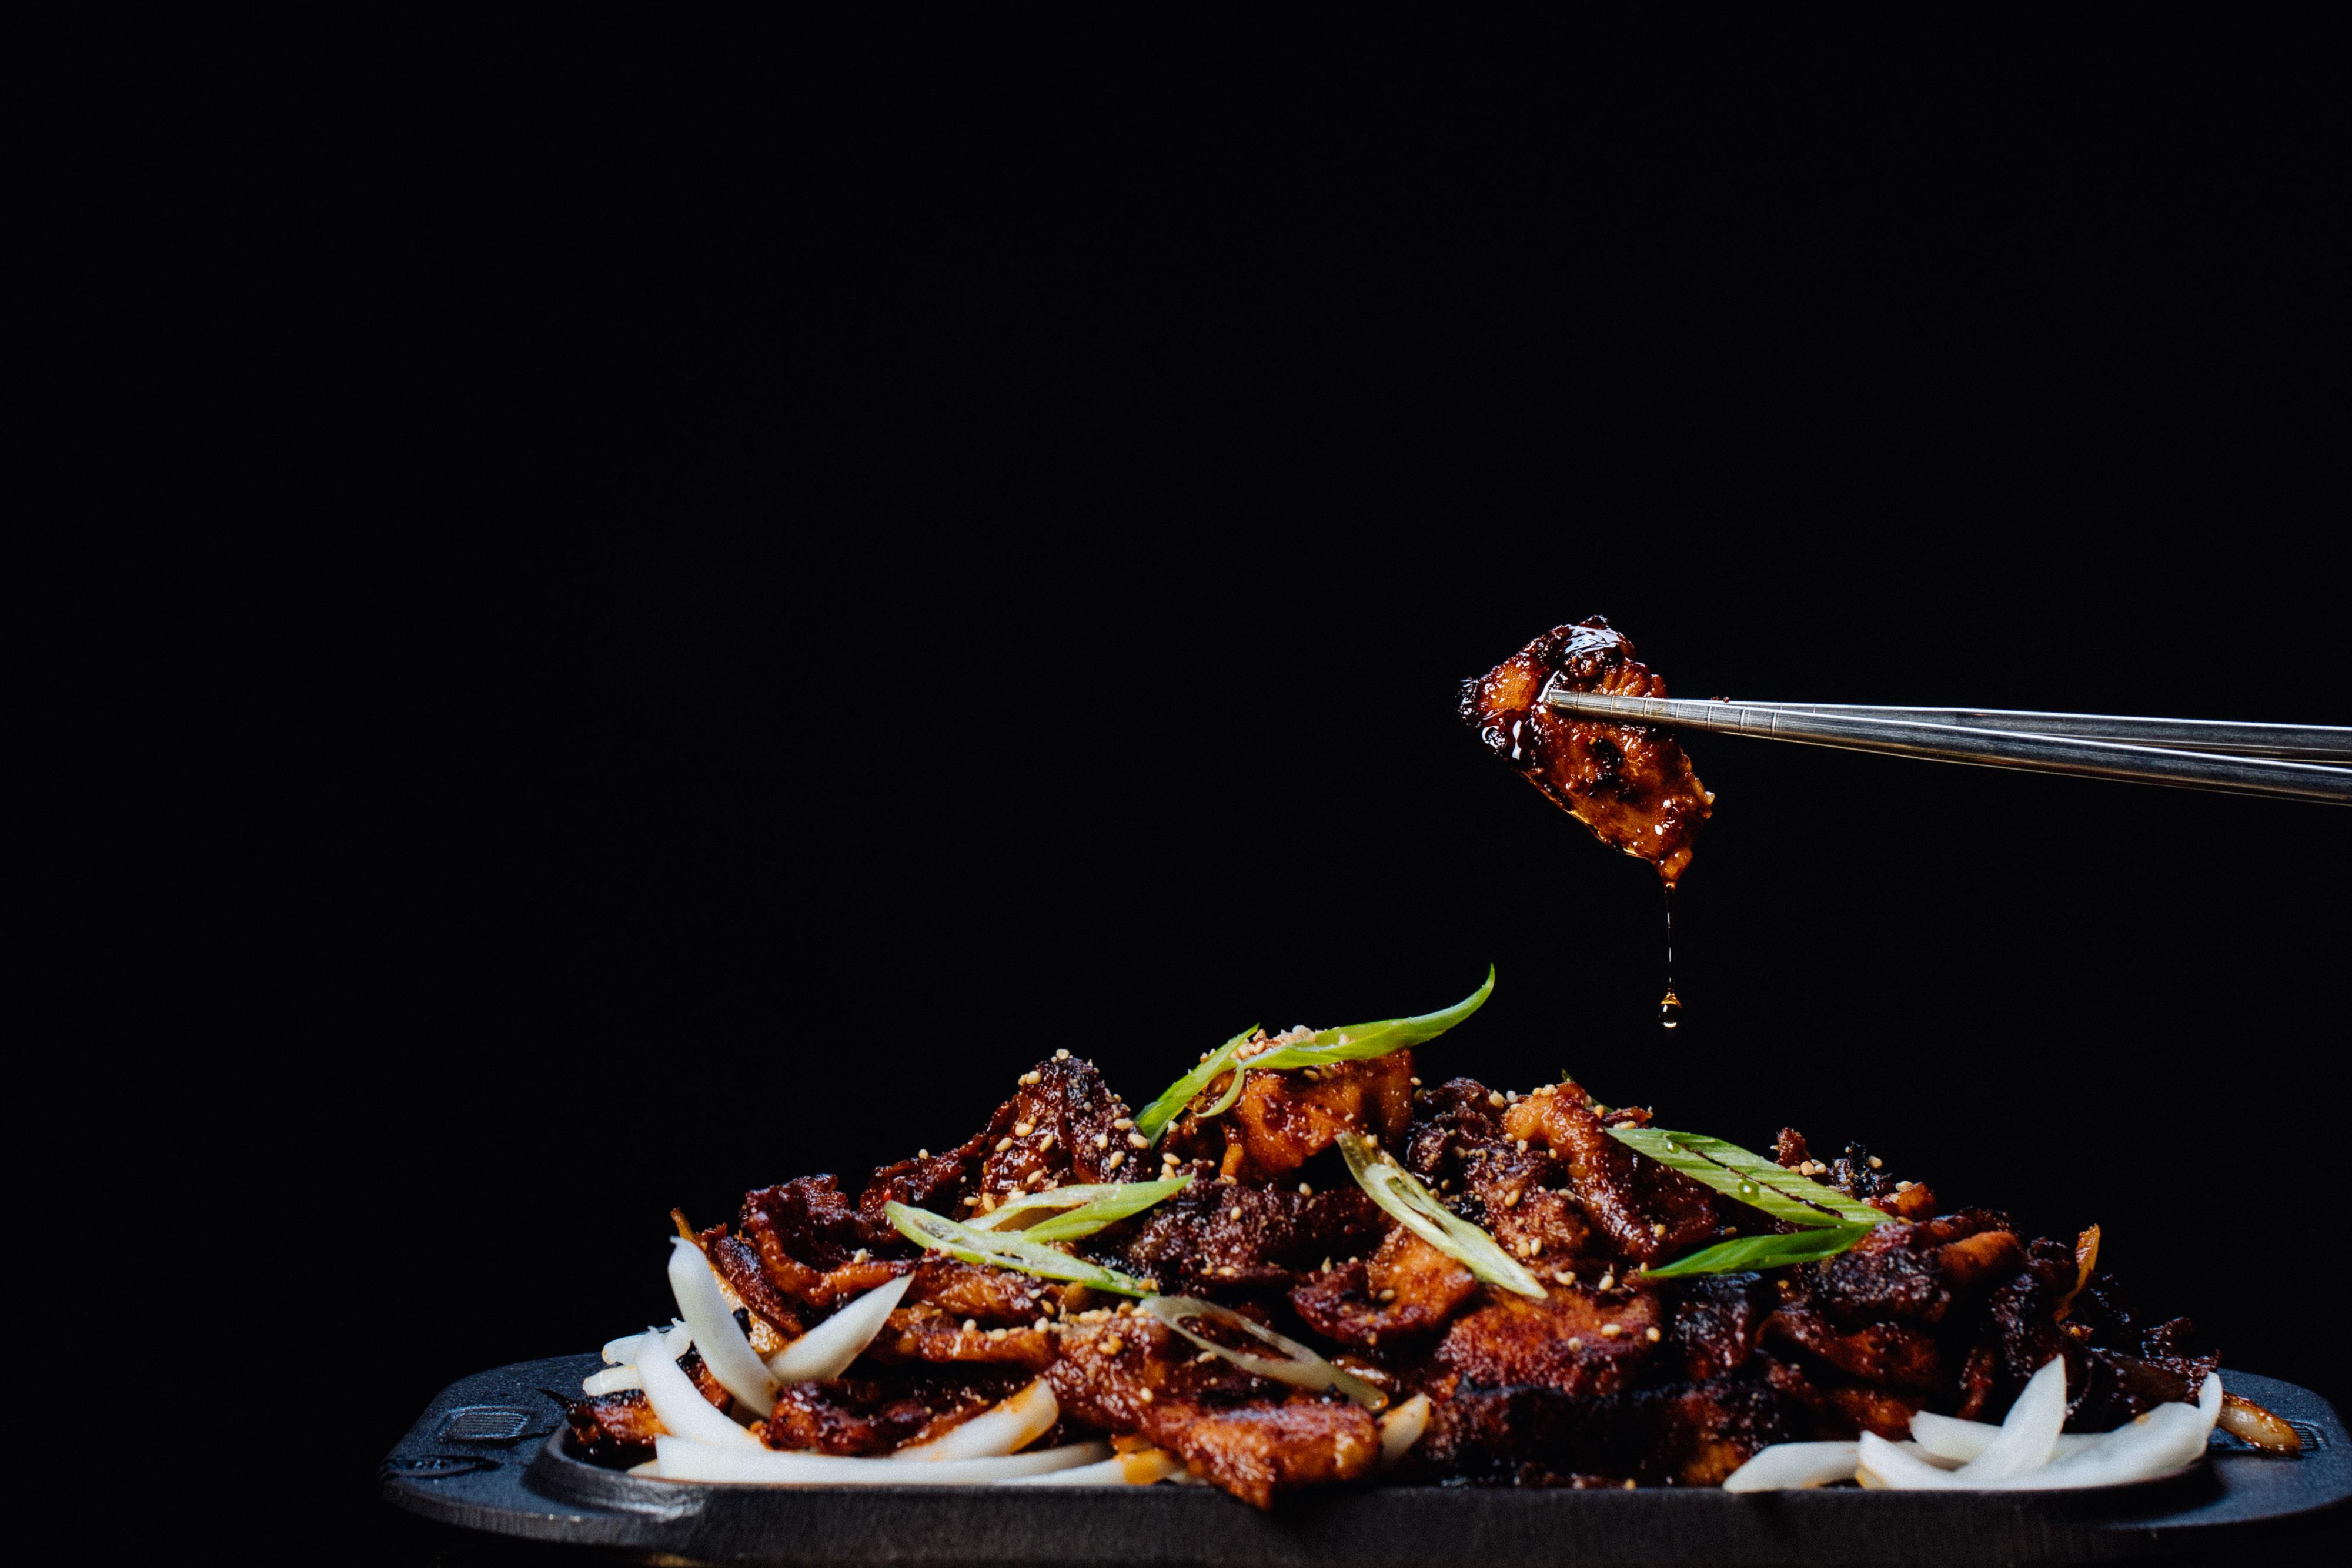 Spicy barbecue pork at Best Friend